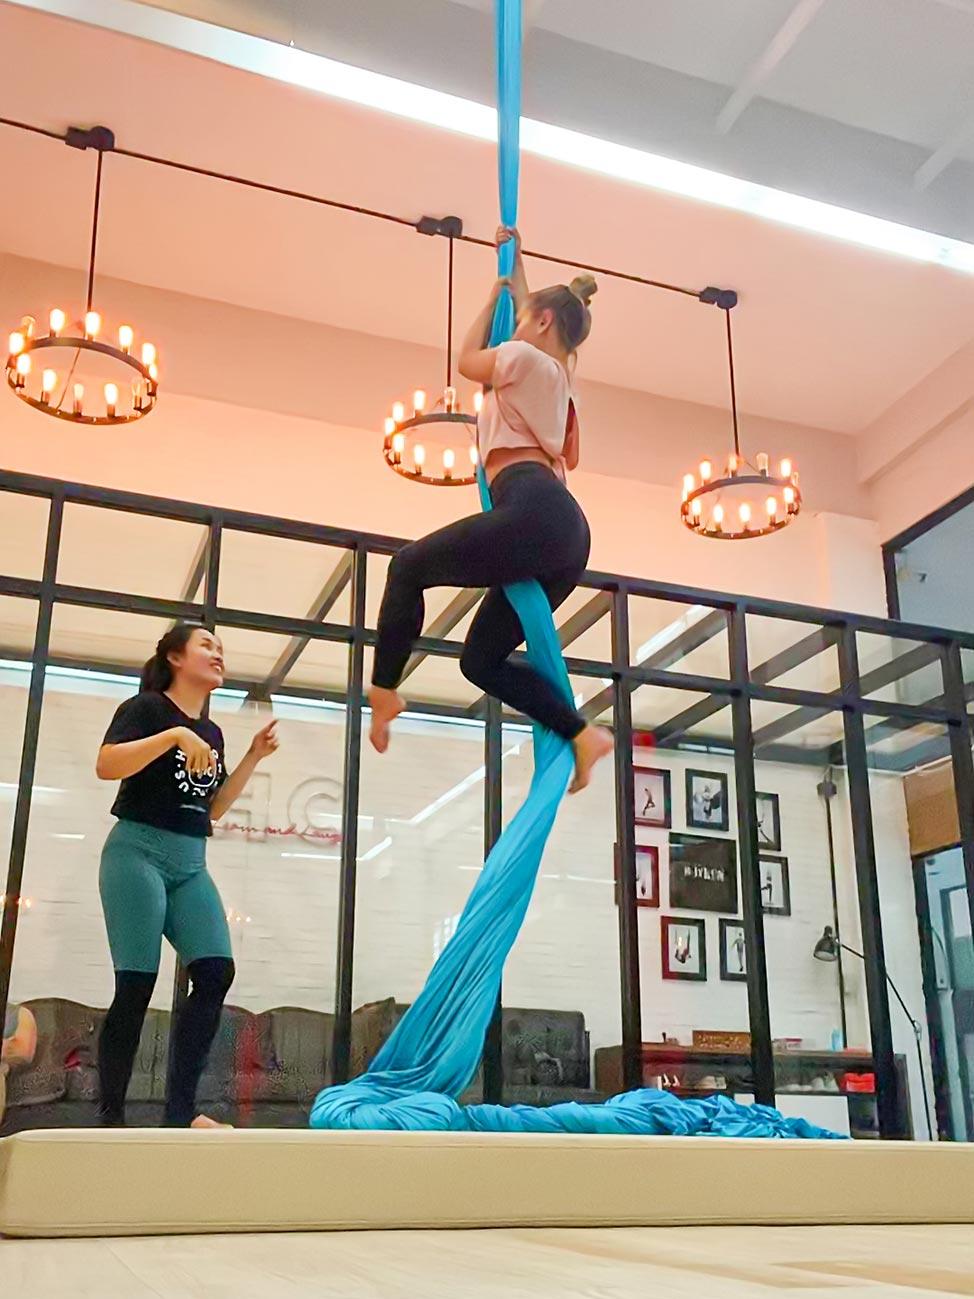 Hoyhon Circus Aerial Studio, Bangkok